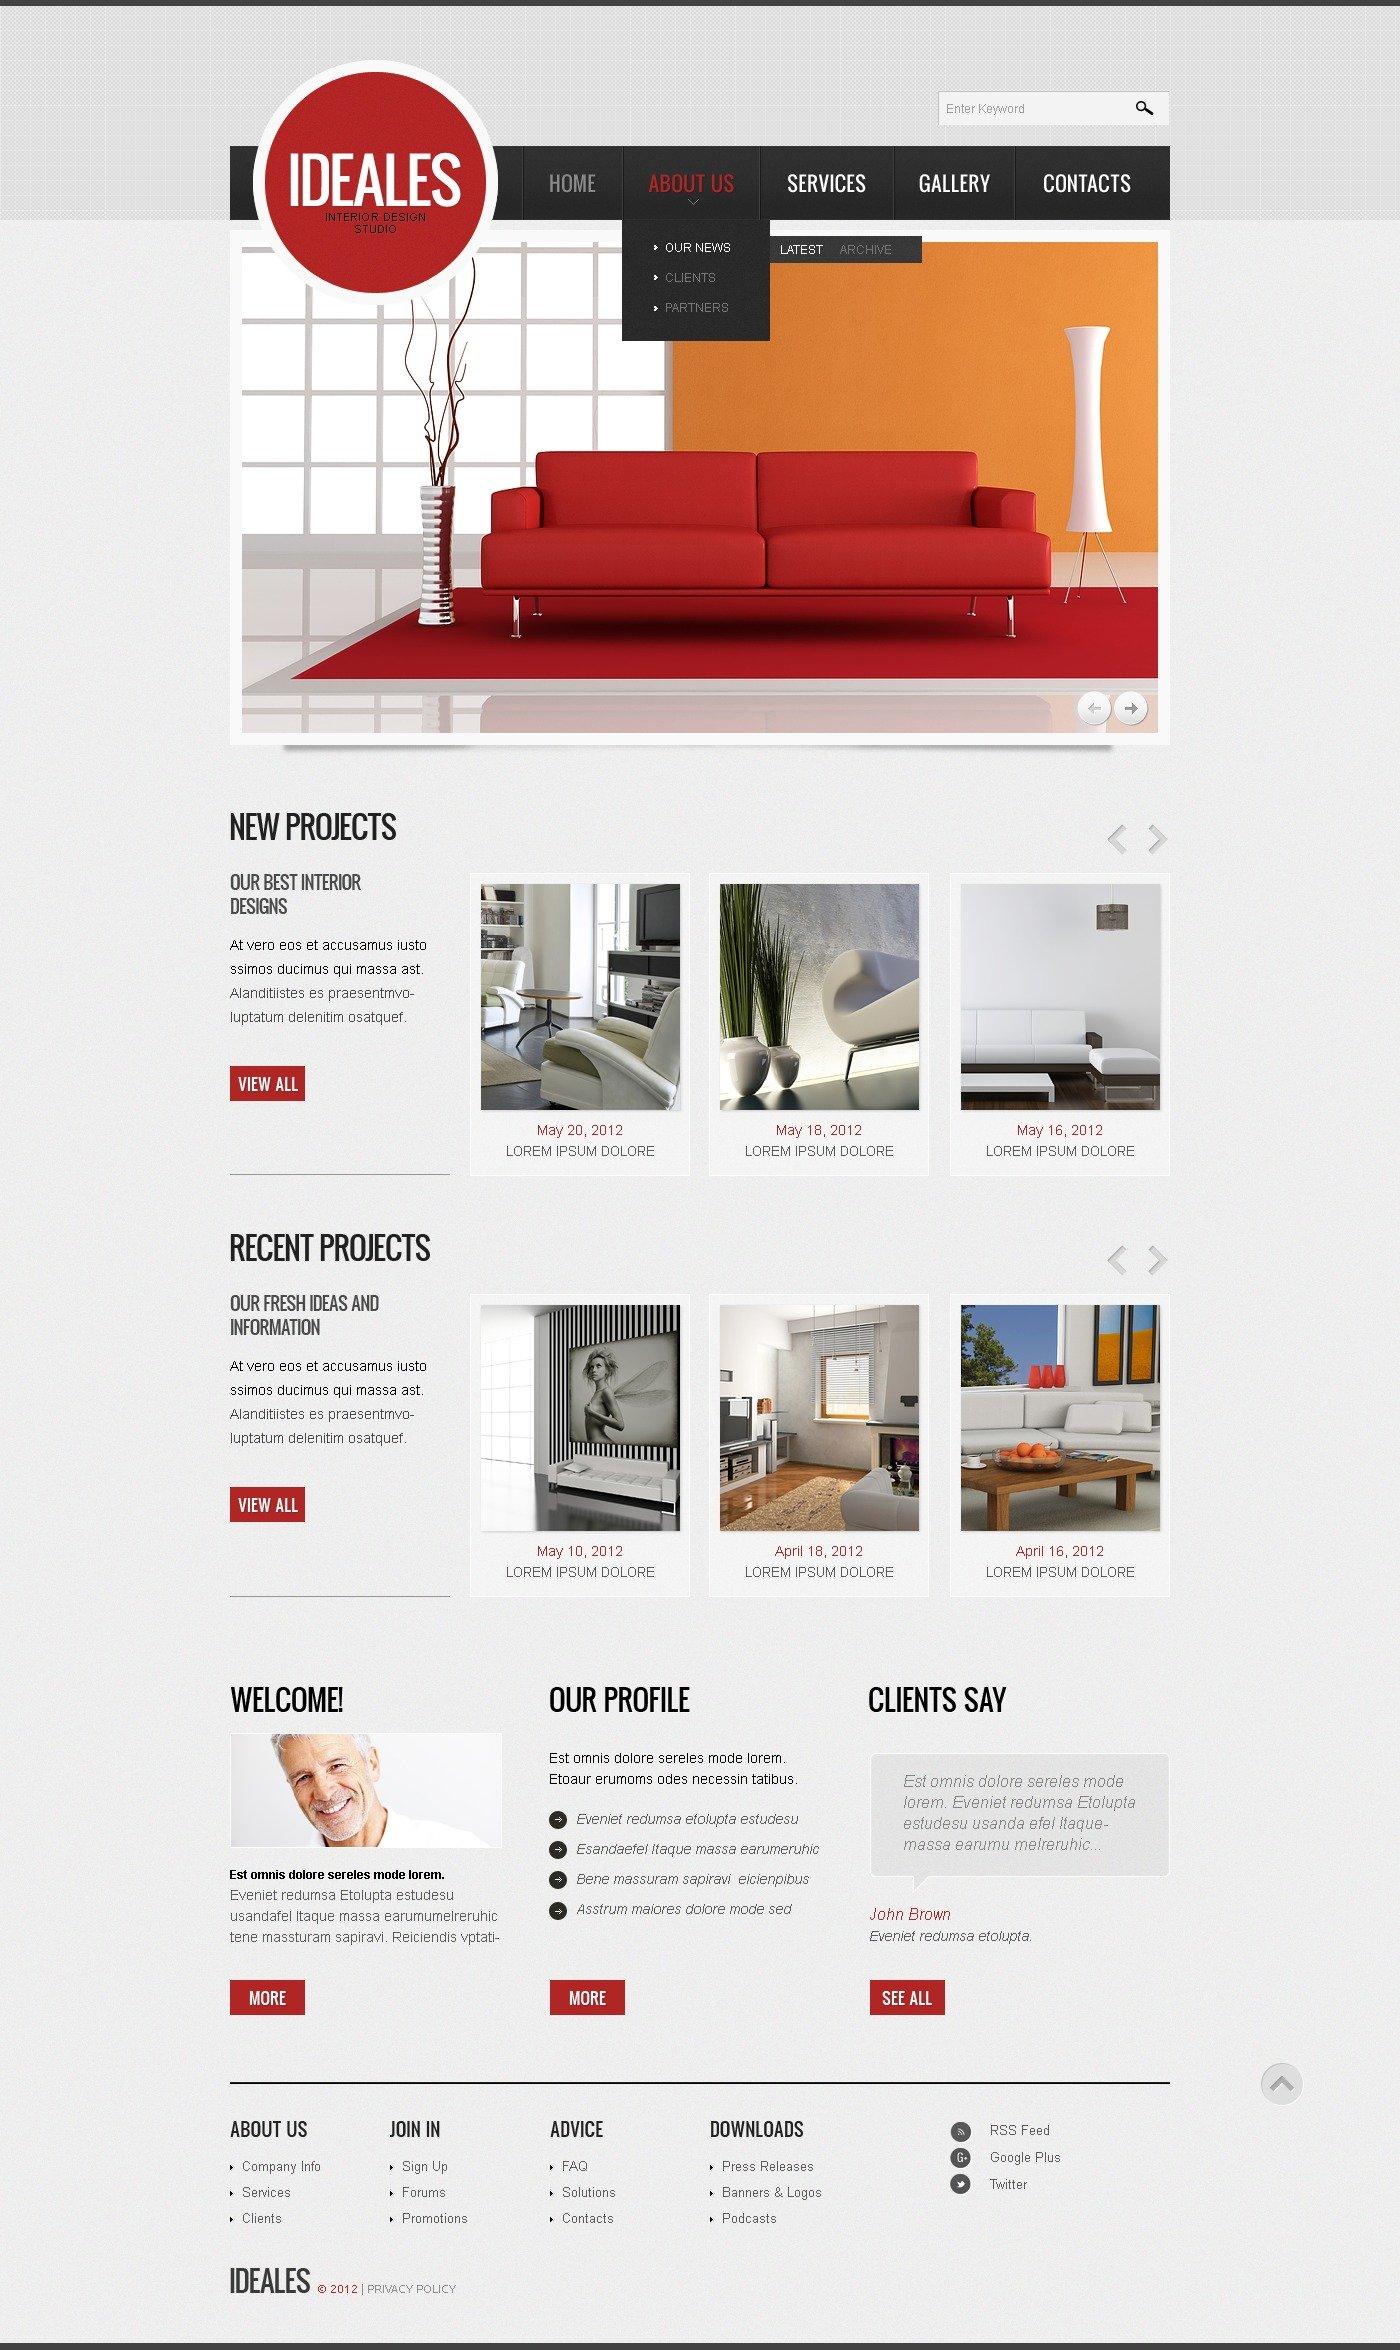 Interior Design Website Template 42812: Interior Design Responsive Website Template #40952